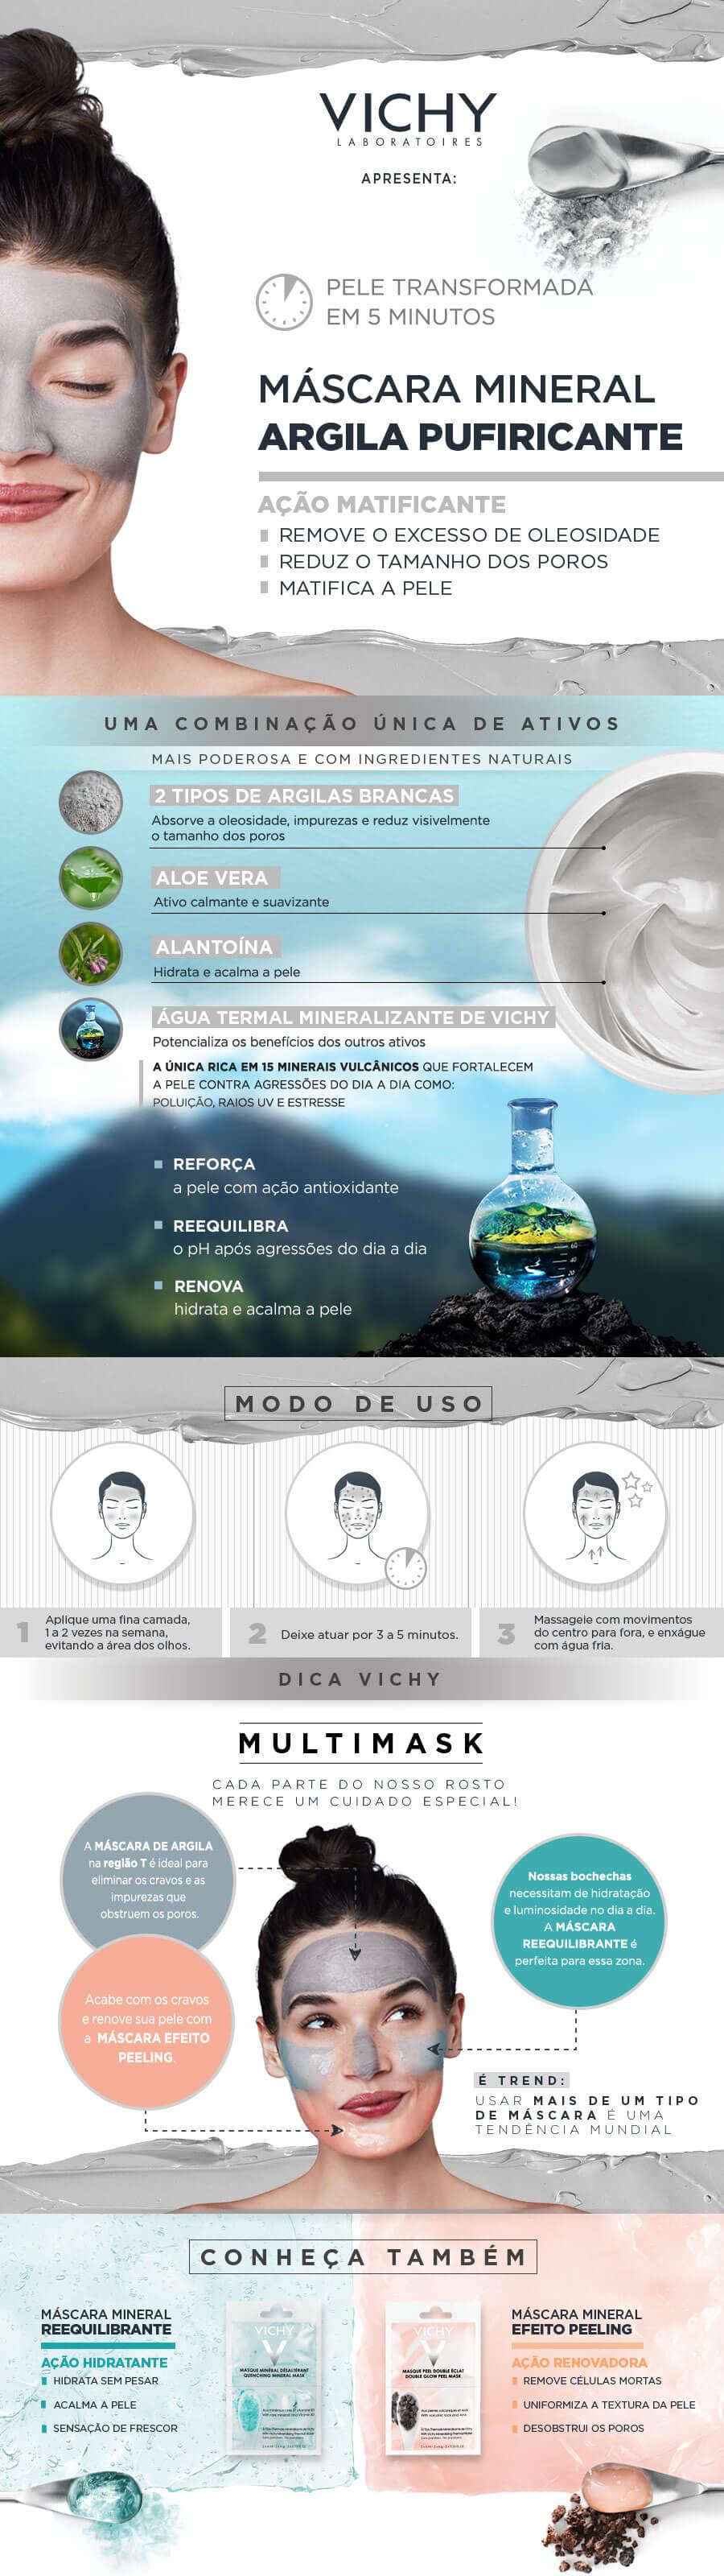 Mascara Mineral Vichy Duo Argila Purificante